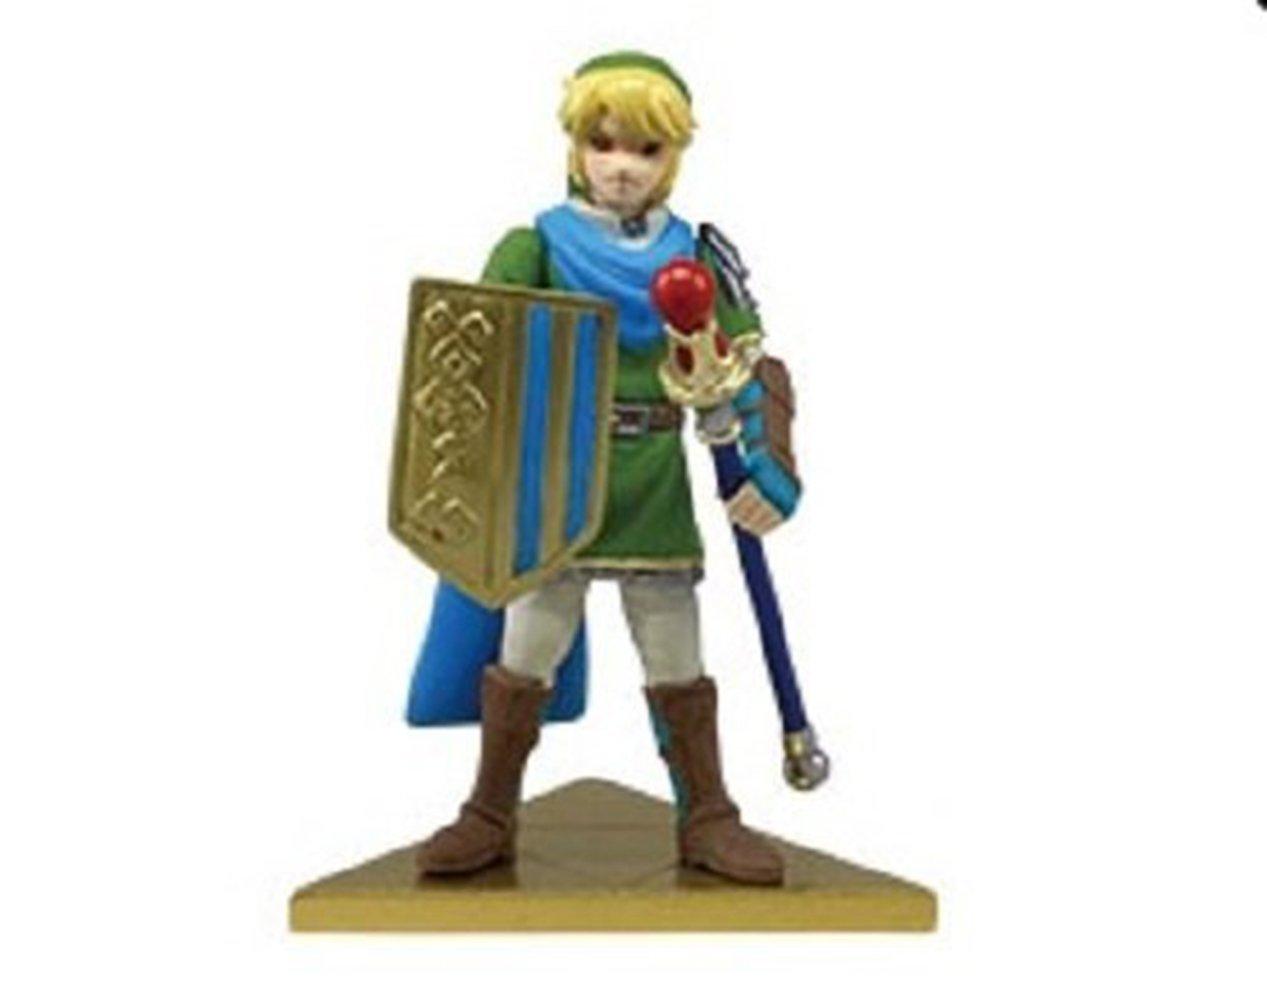 Takara Tomy ARTS Link Legend of Zelda Muso Hyrule Warriors Stand Figurine